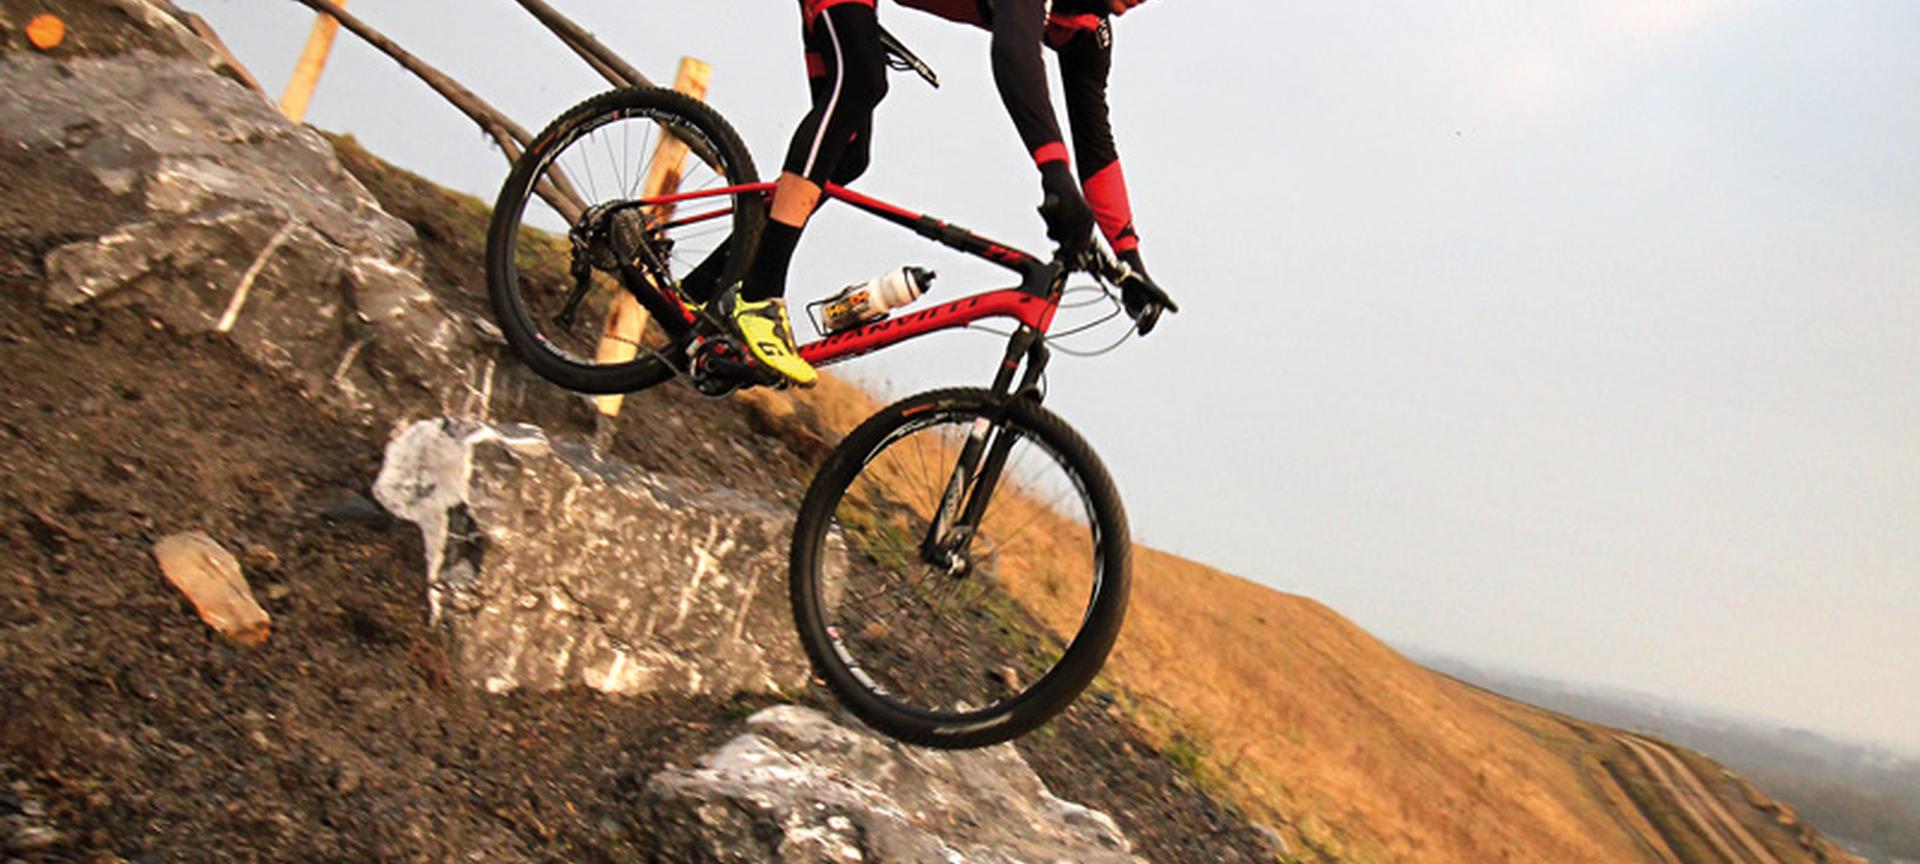 Mountainbikeparcours avonturenberg be-MINE_9E22_1